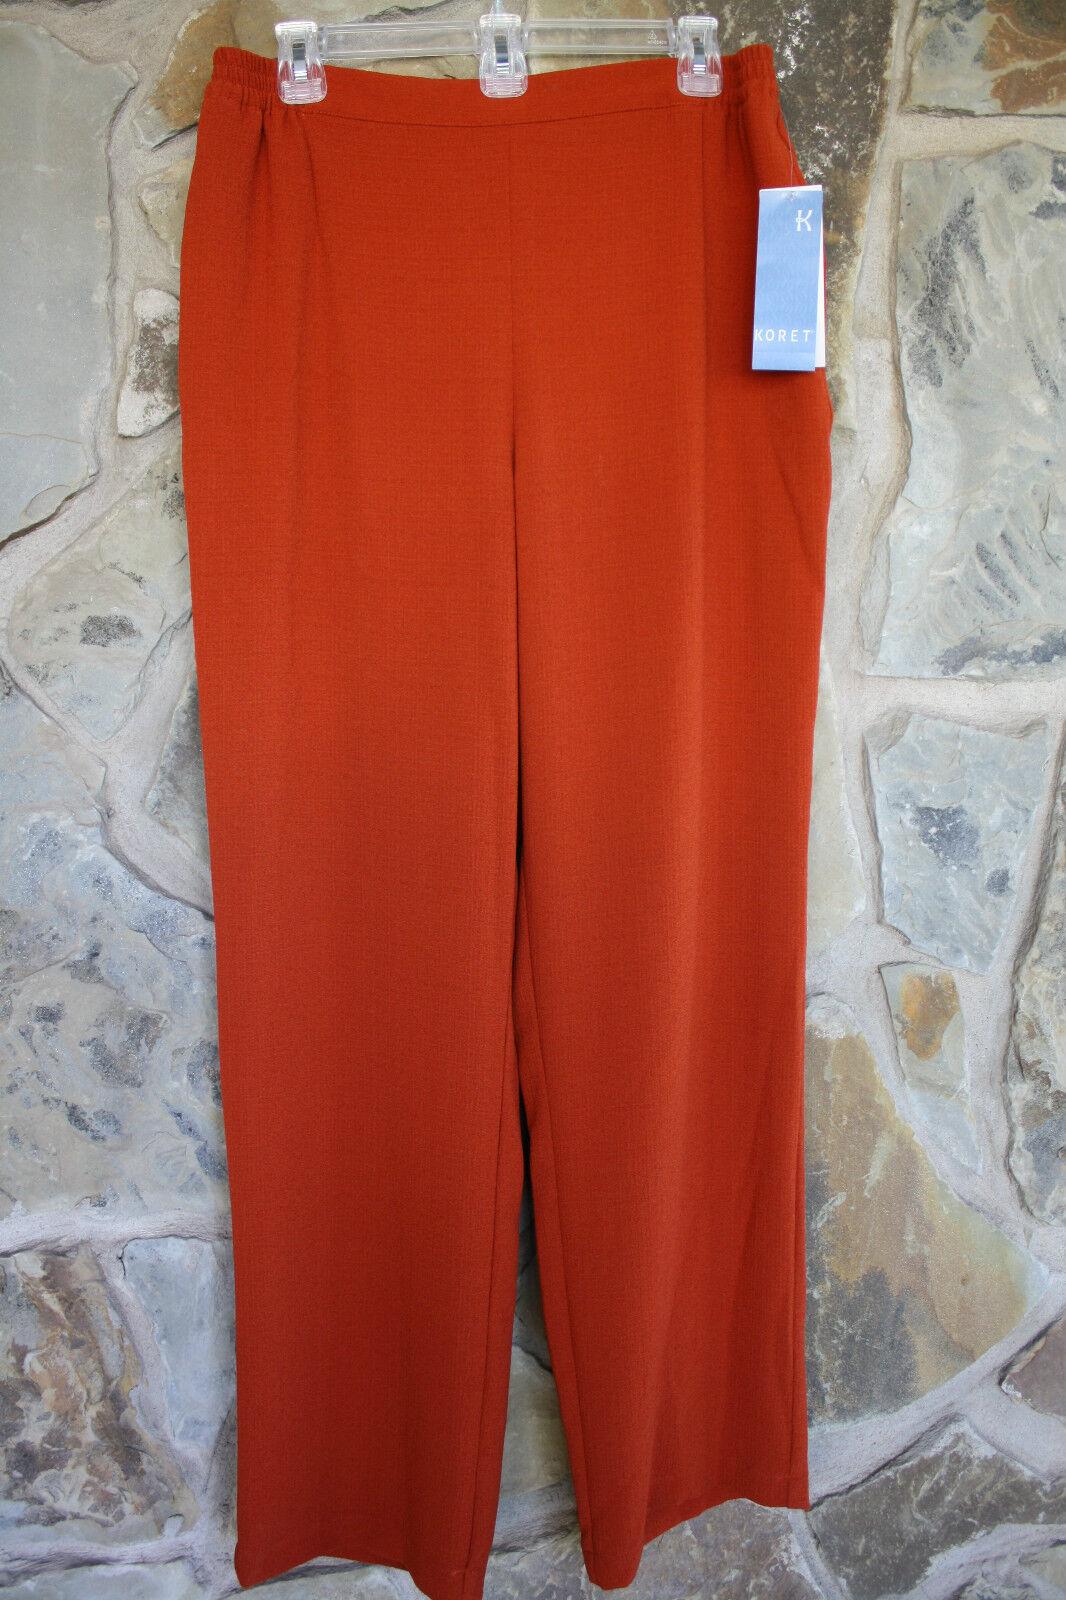 Koret Hose Größe 12 comfort stretch NWT copper